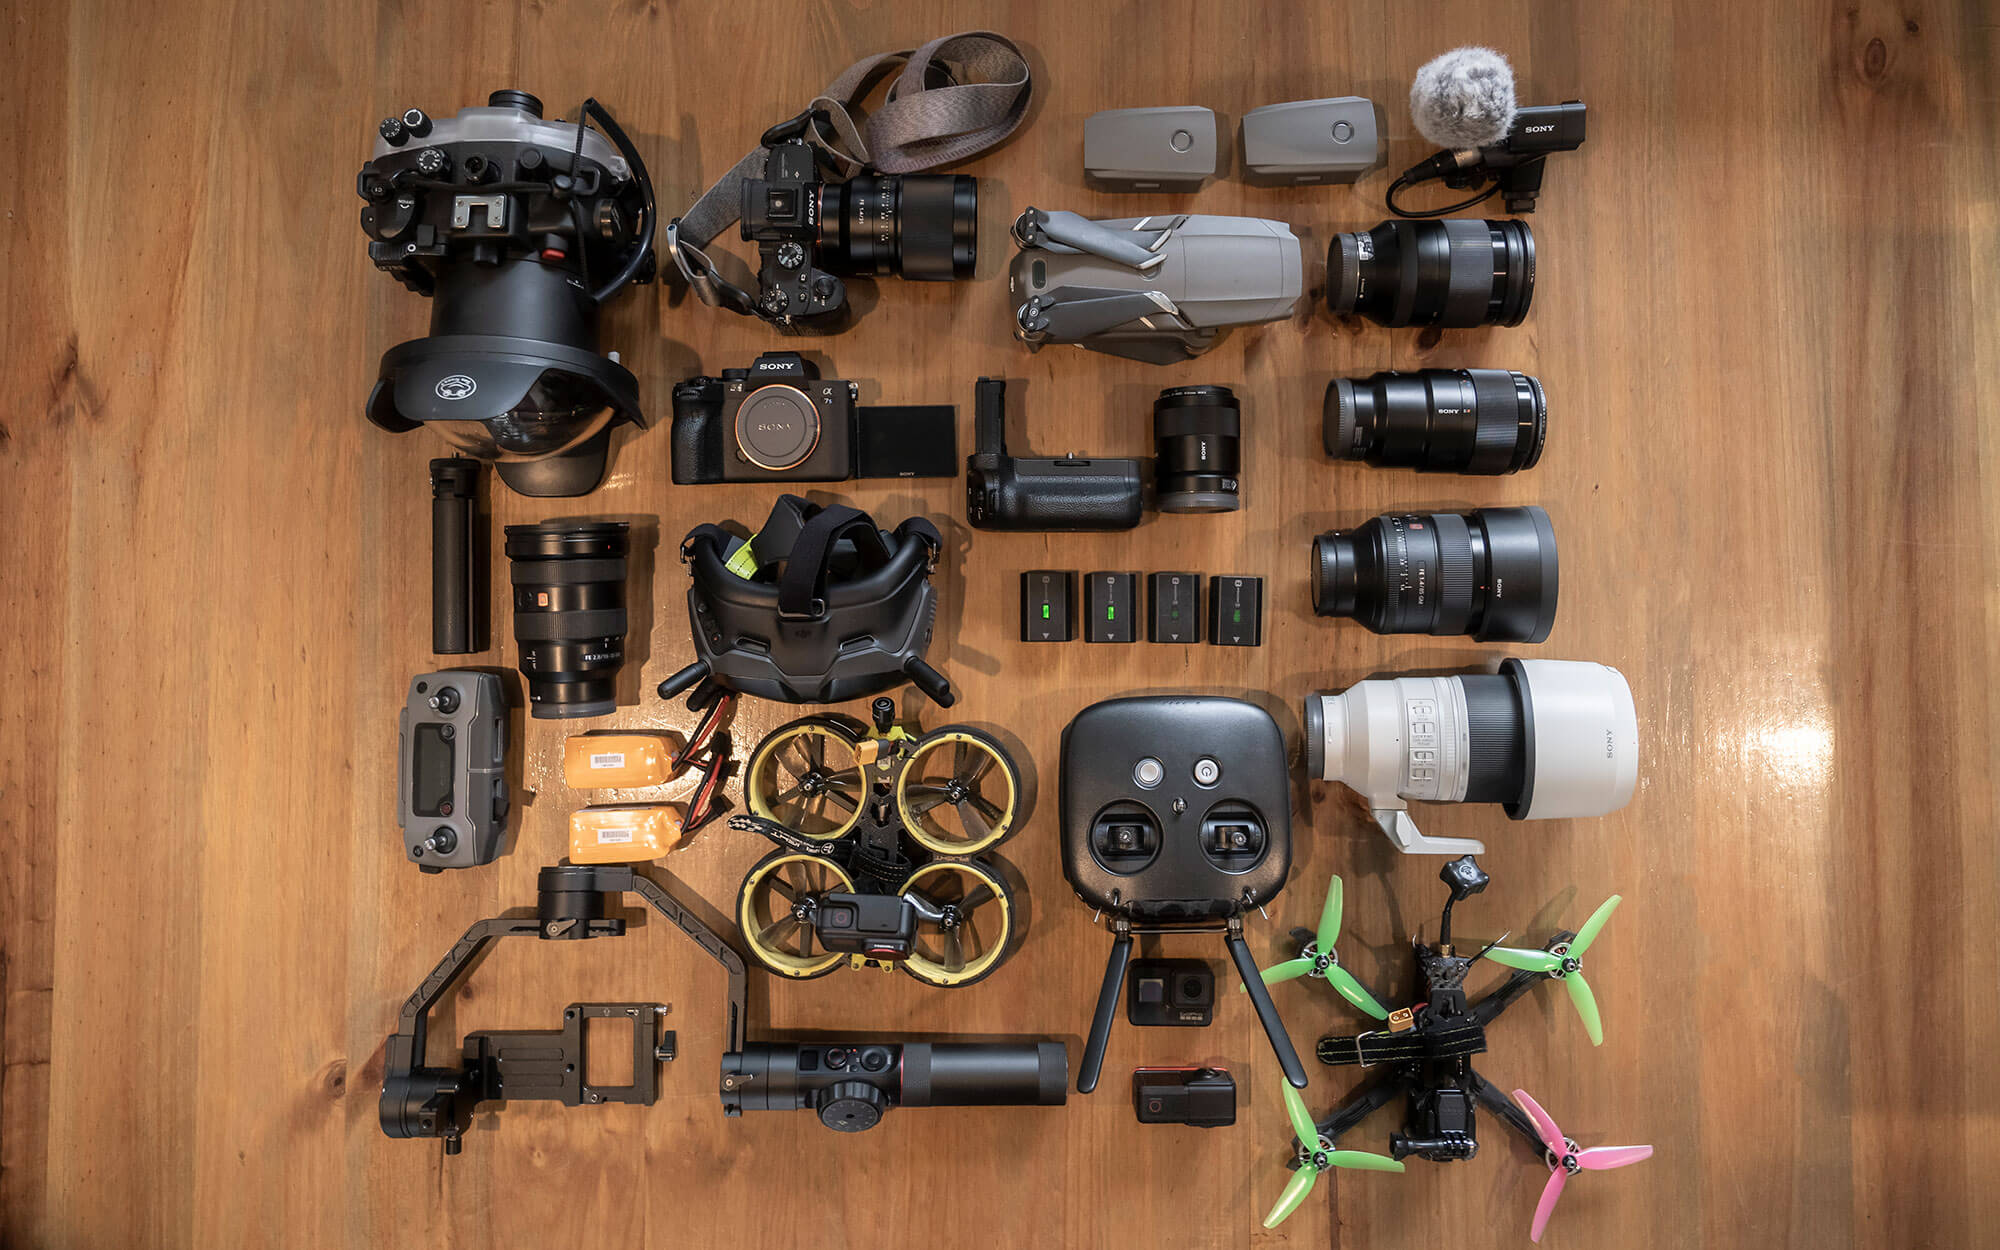 Benn's Camera Kit Flatlay Image